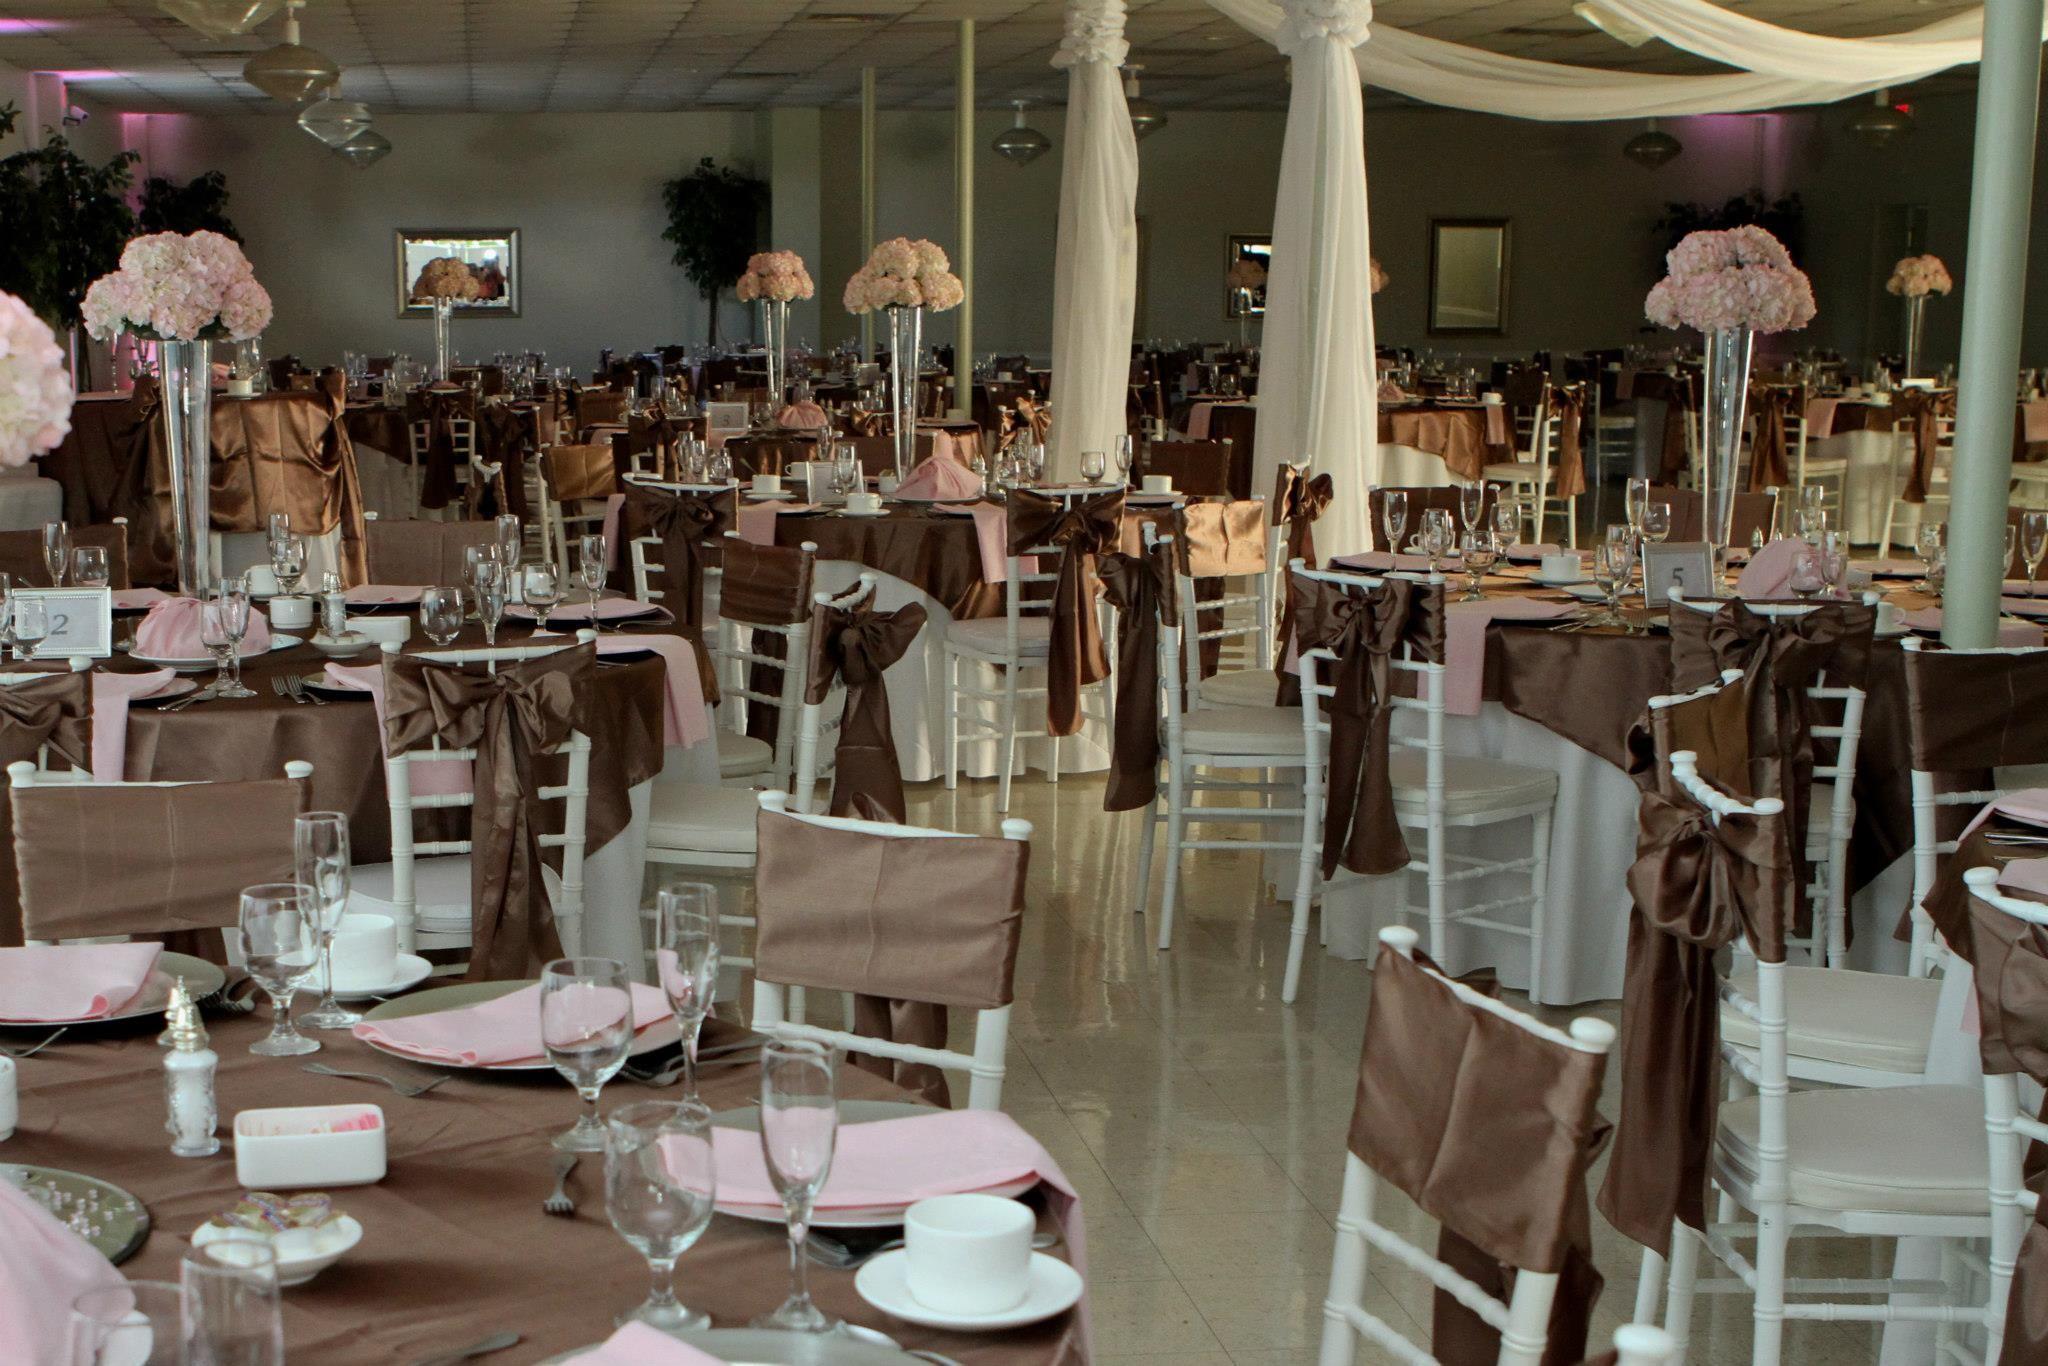 My Wedding Decor Wedding Colors Idea Latte W Baby Pink Combo